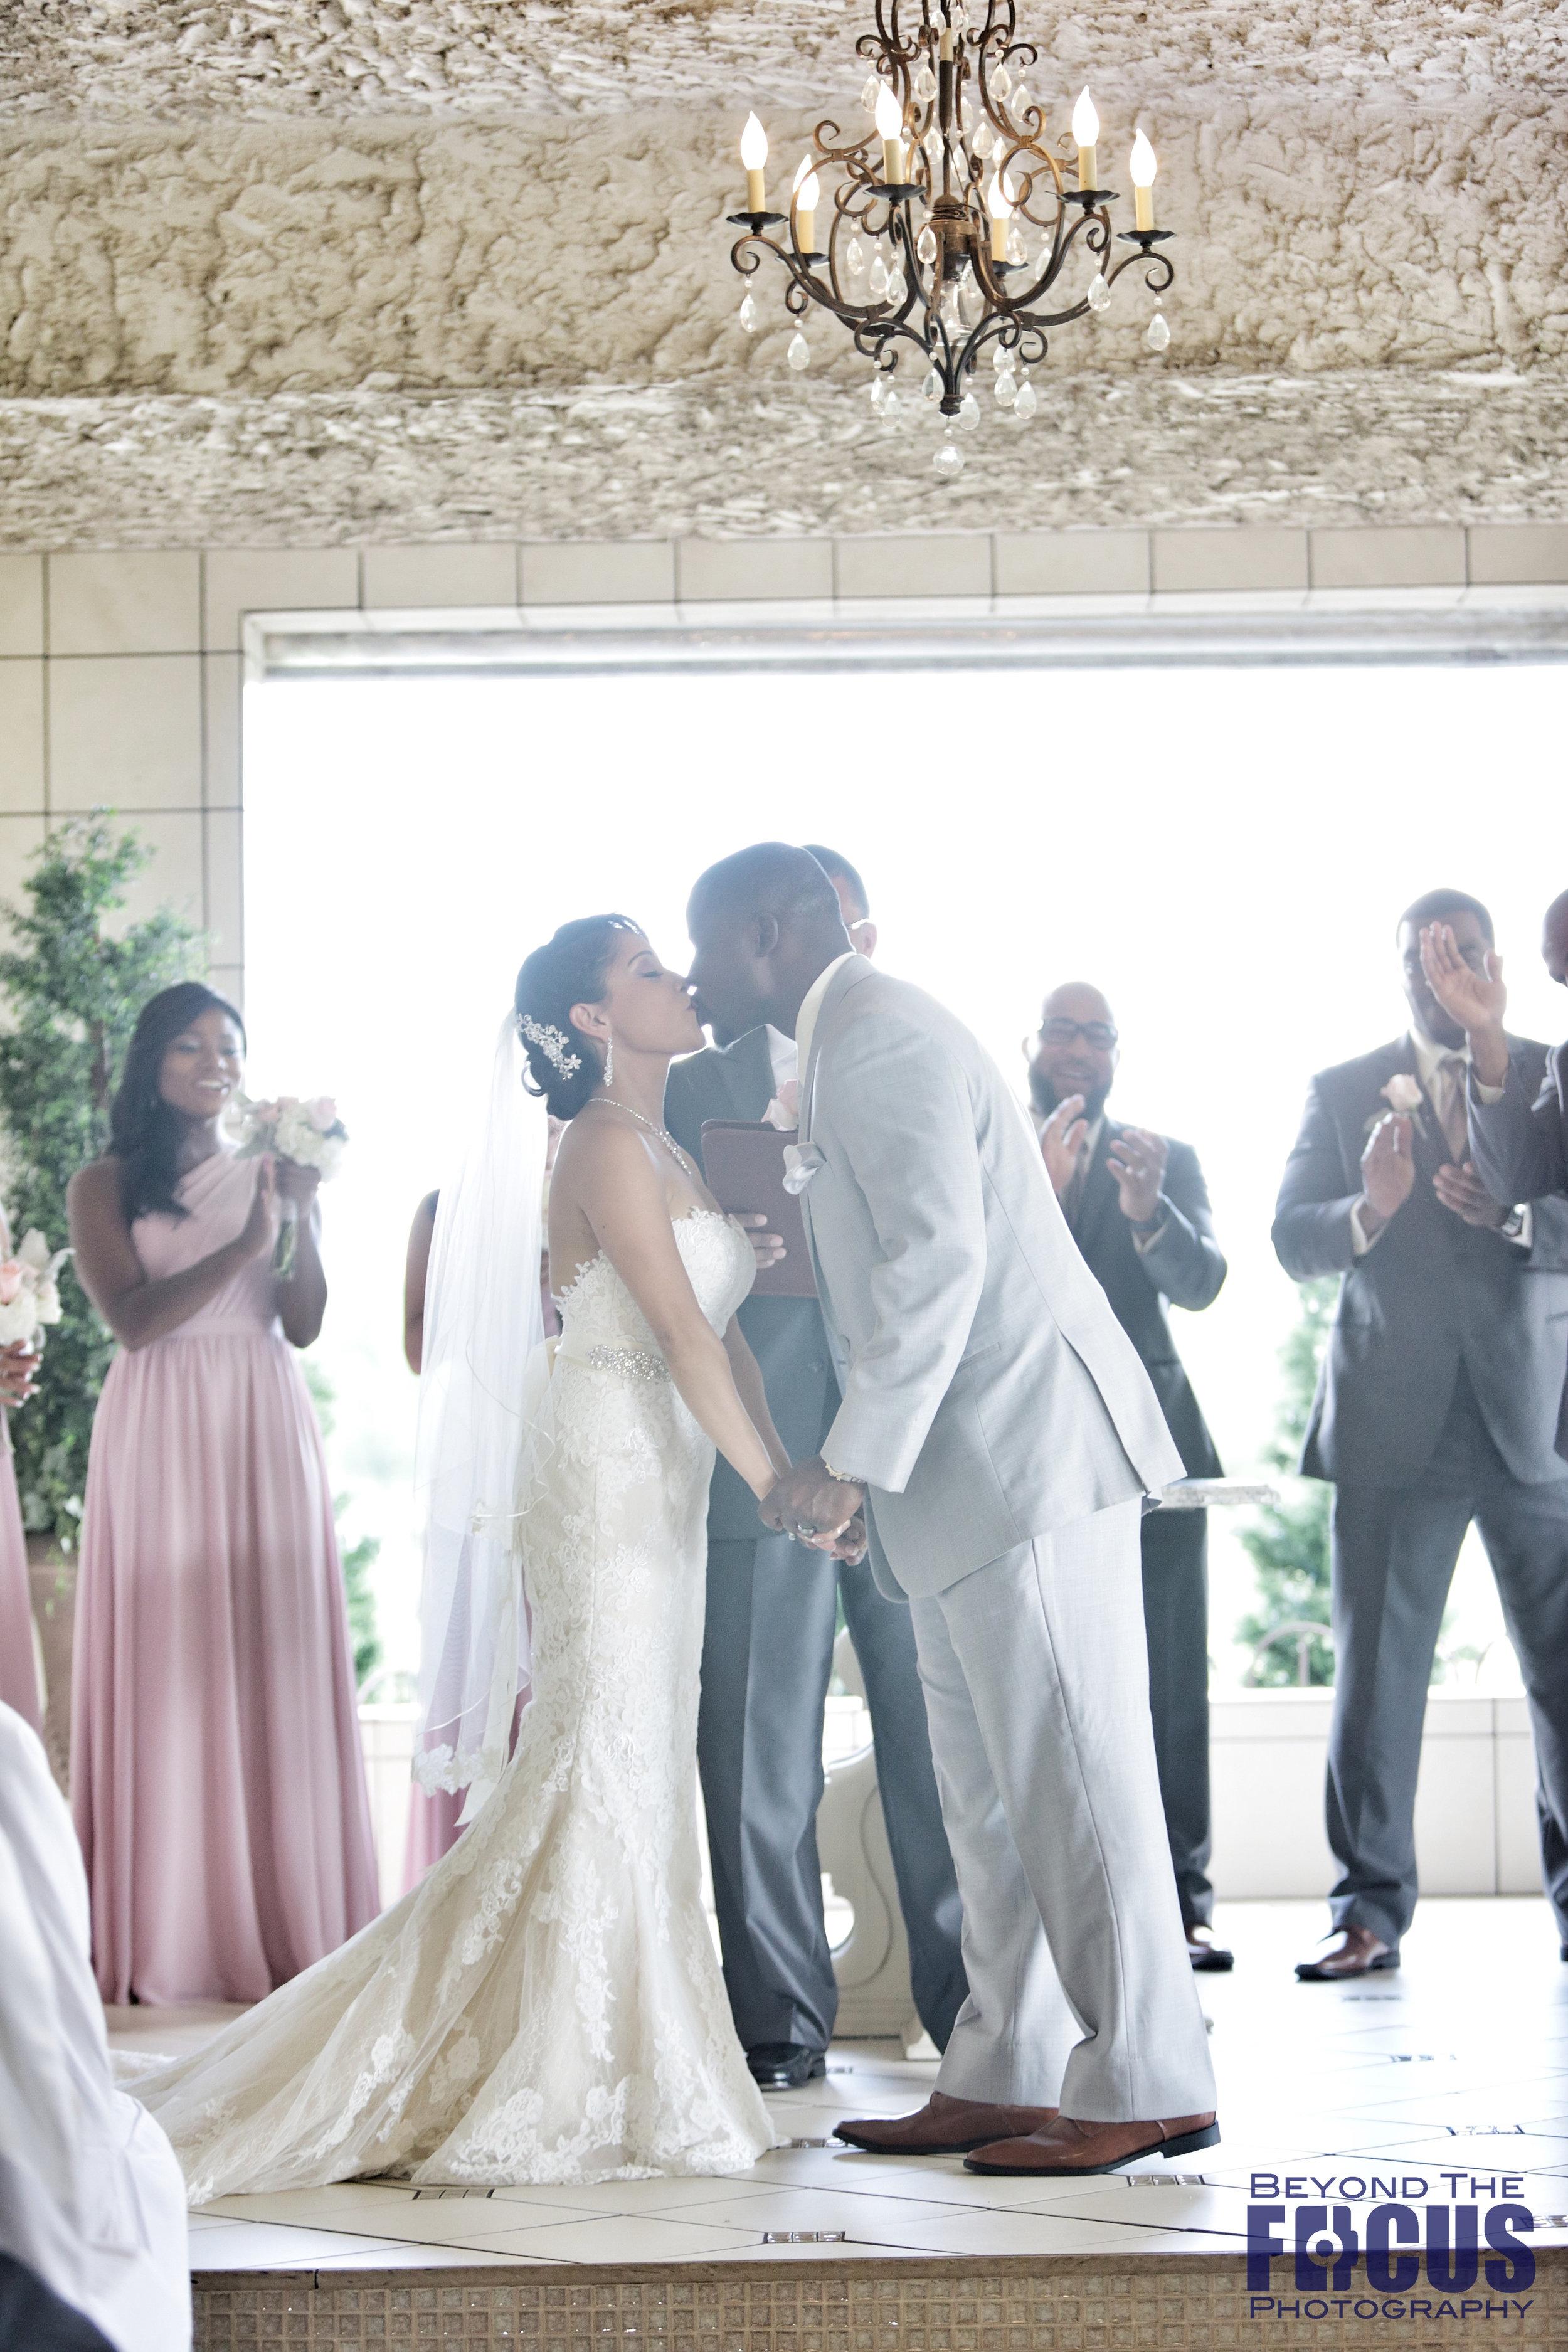 Palmer Wedding - Wedding Ceremony49.jpg